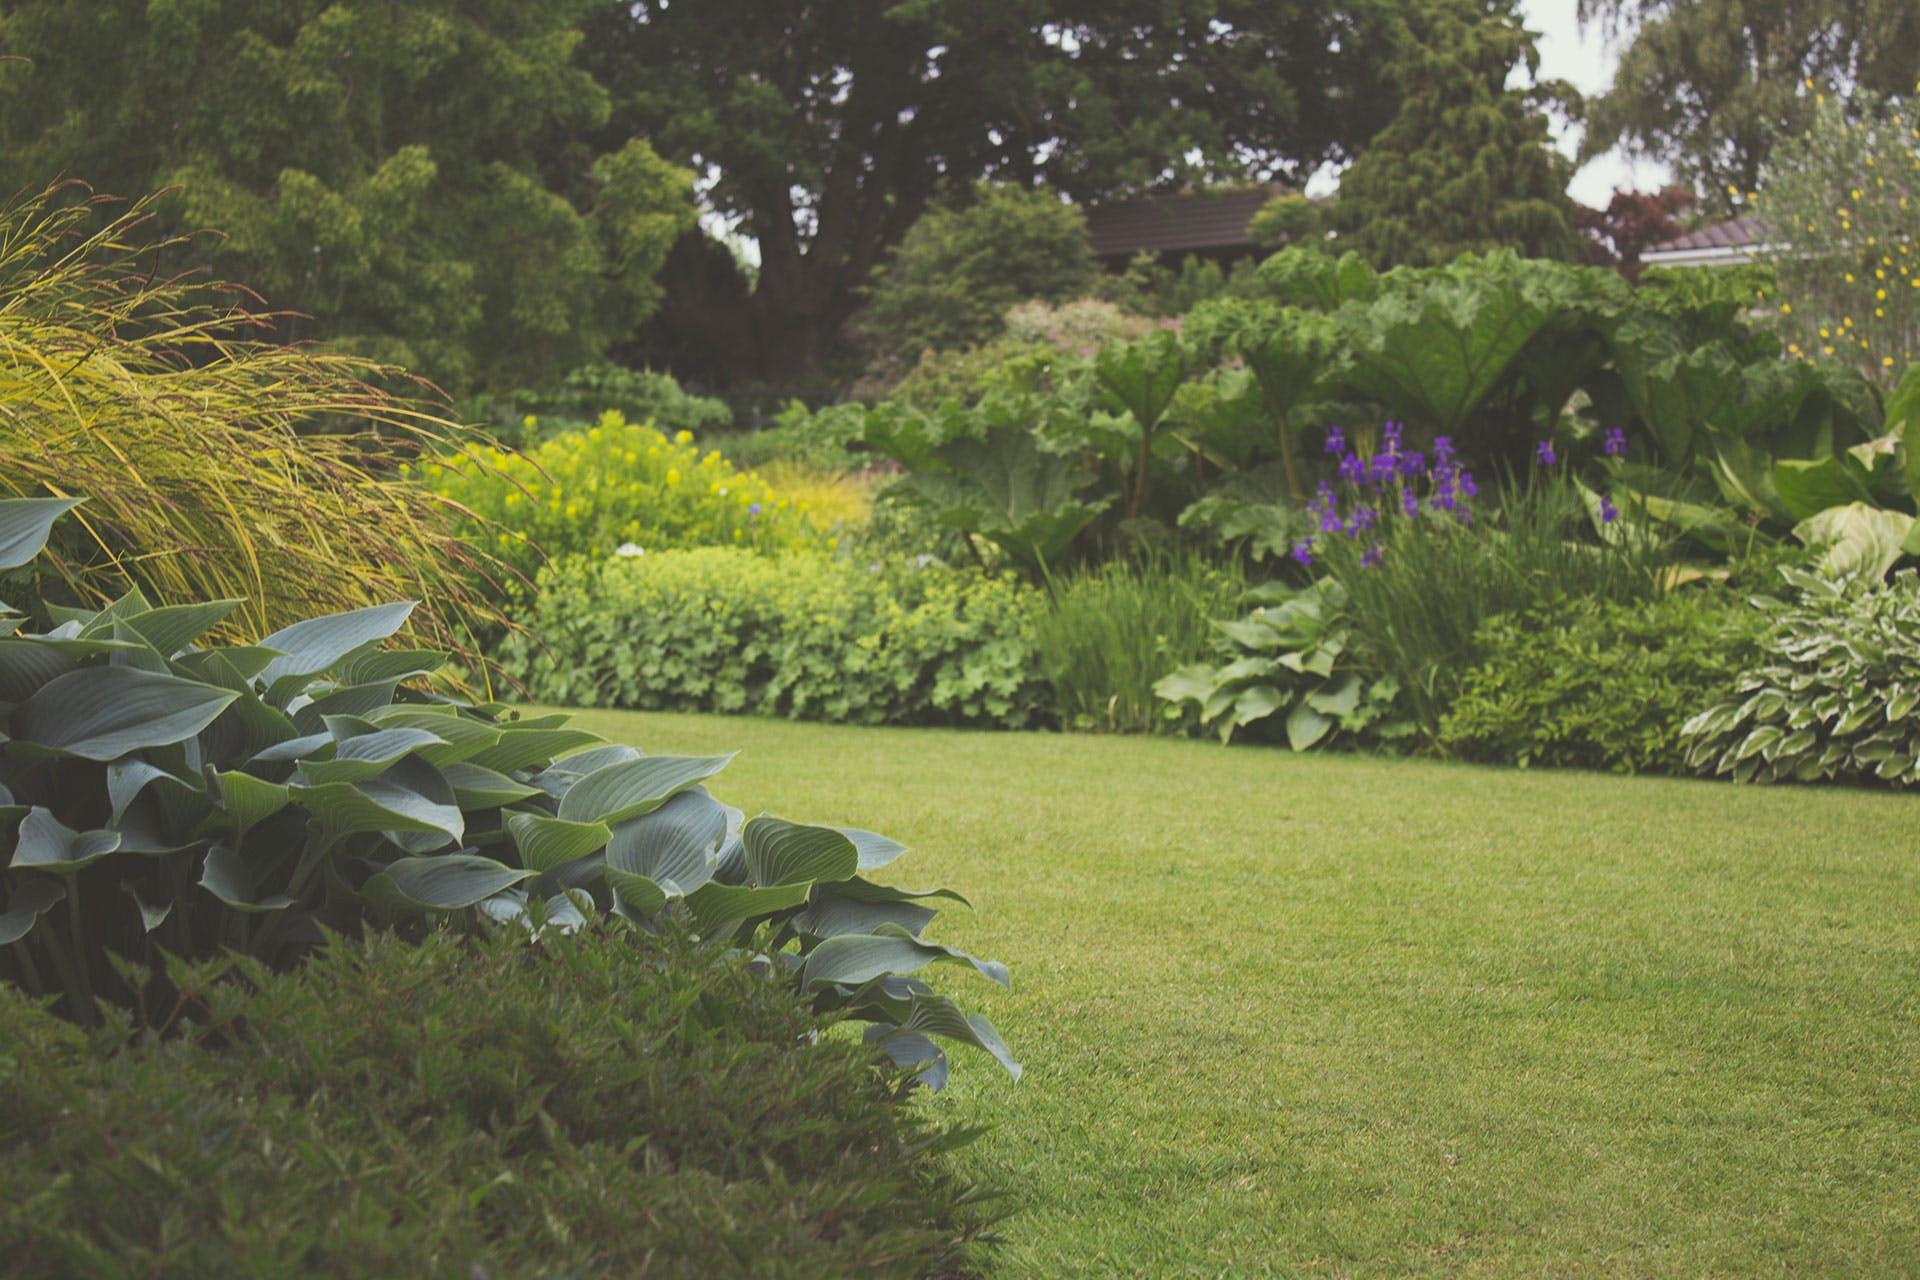 Bahçe, bitkiler, çim